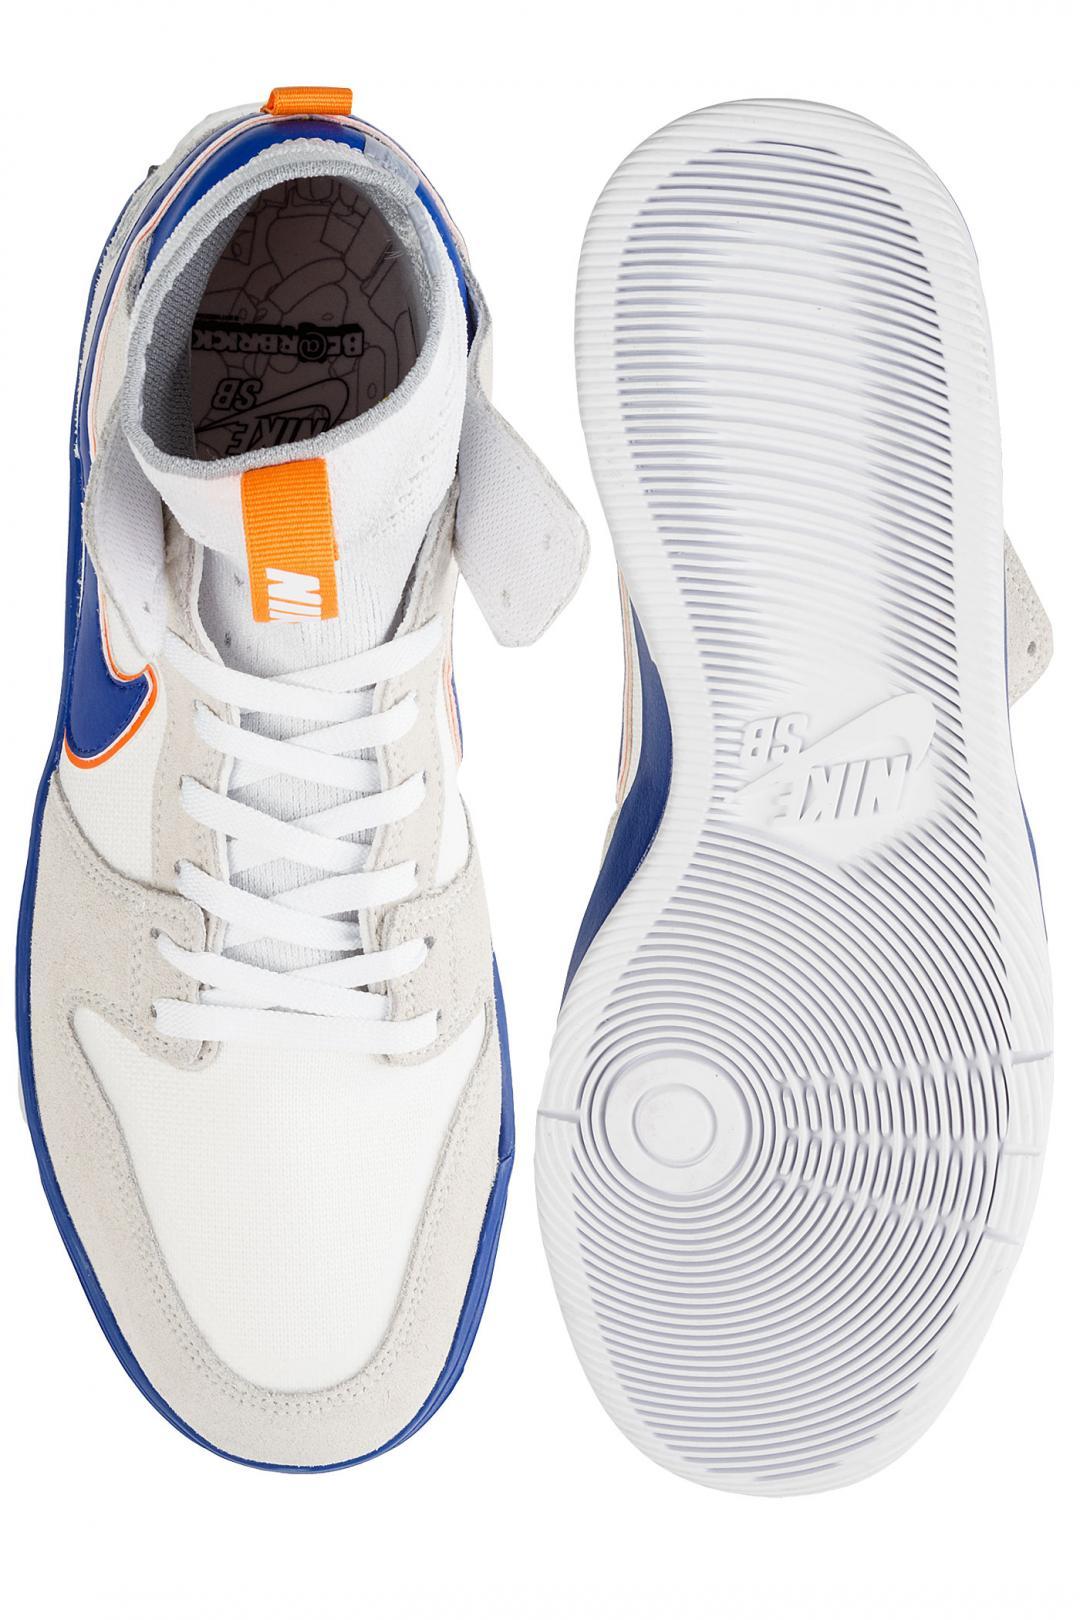 Uomo Nike SB x Medicom Dunk High Elite QS white college blue | Sneakers high top